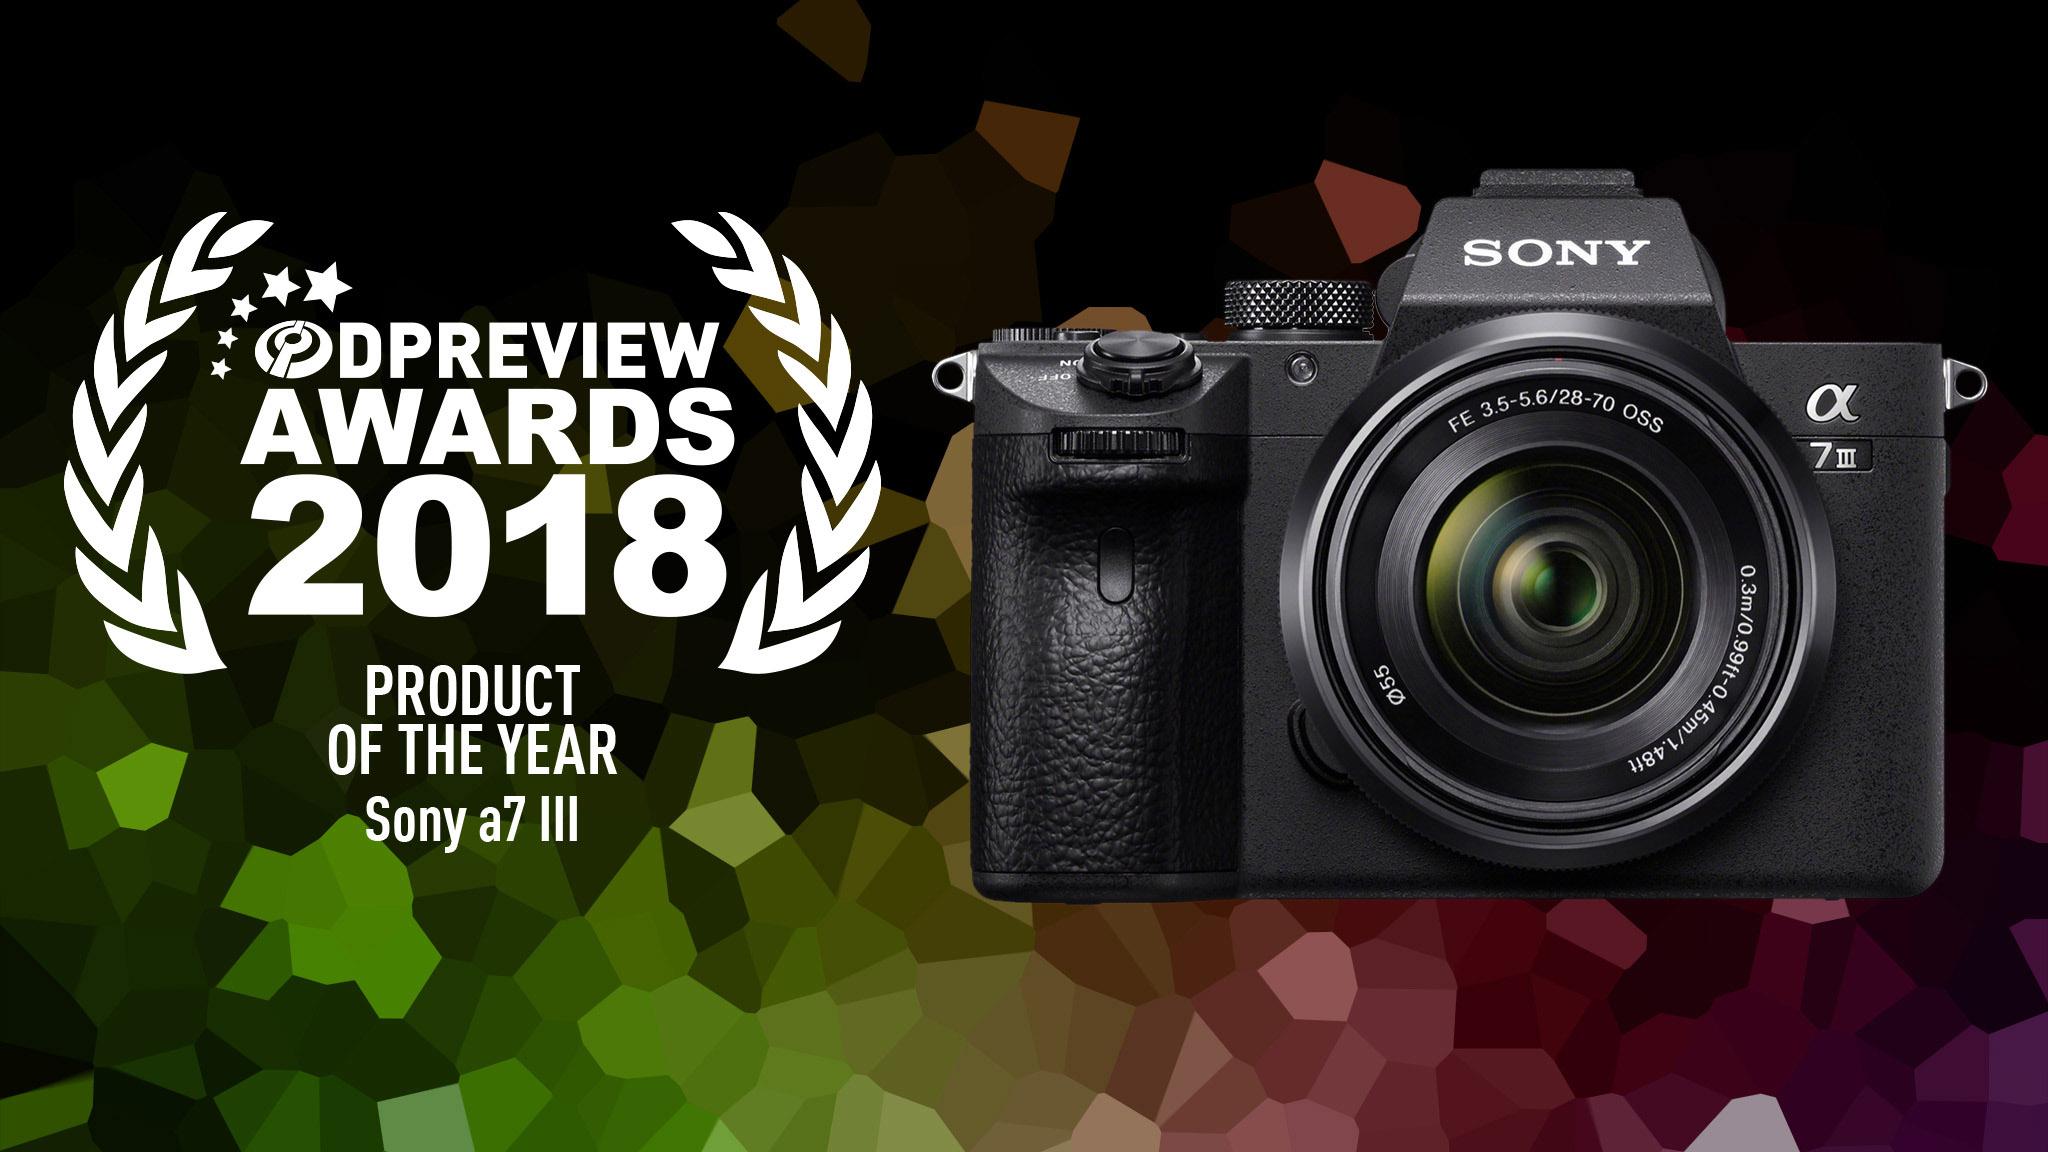 Sony A7III awards-best-product-2018 - Mark Galer